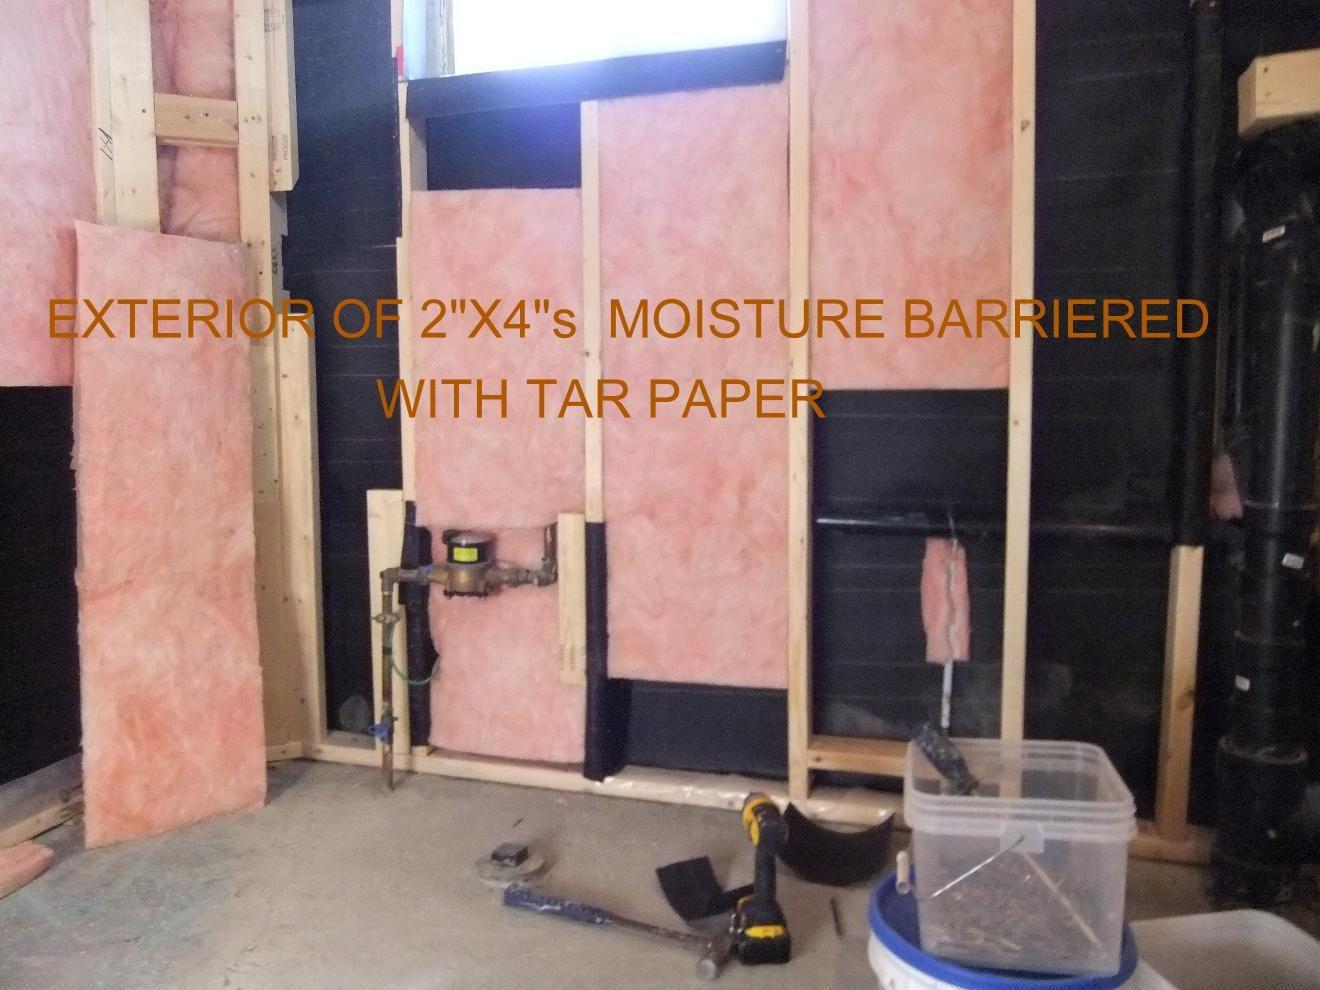 Explore Basement Bathroom, Insulation, And More!